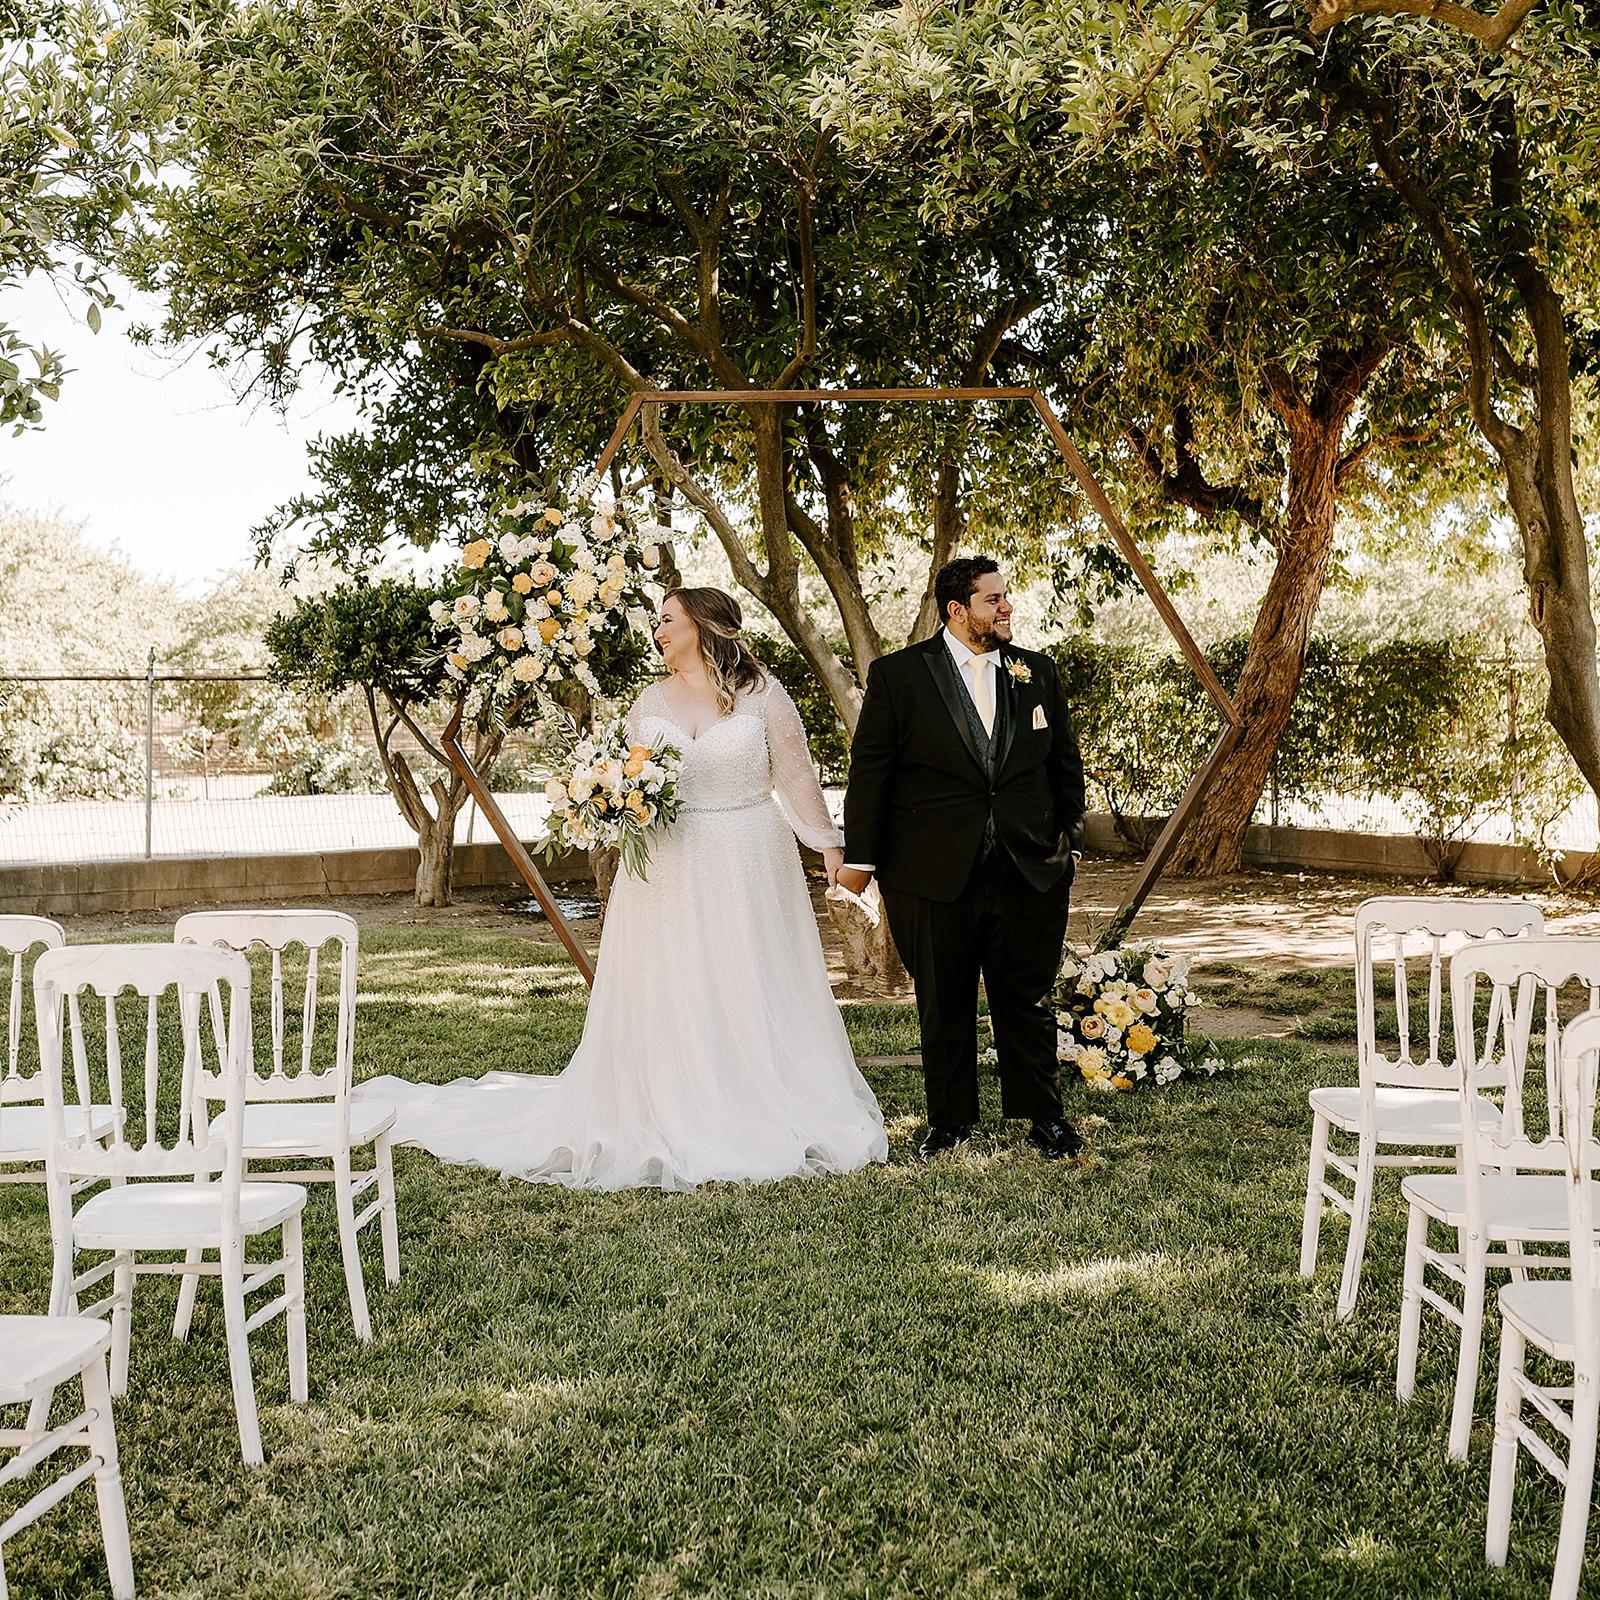 Natacha Jolene Photography and Film Freshly Squeezed Woodland Wedding as seen in Real Weddings Magazine